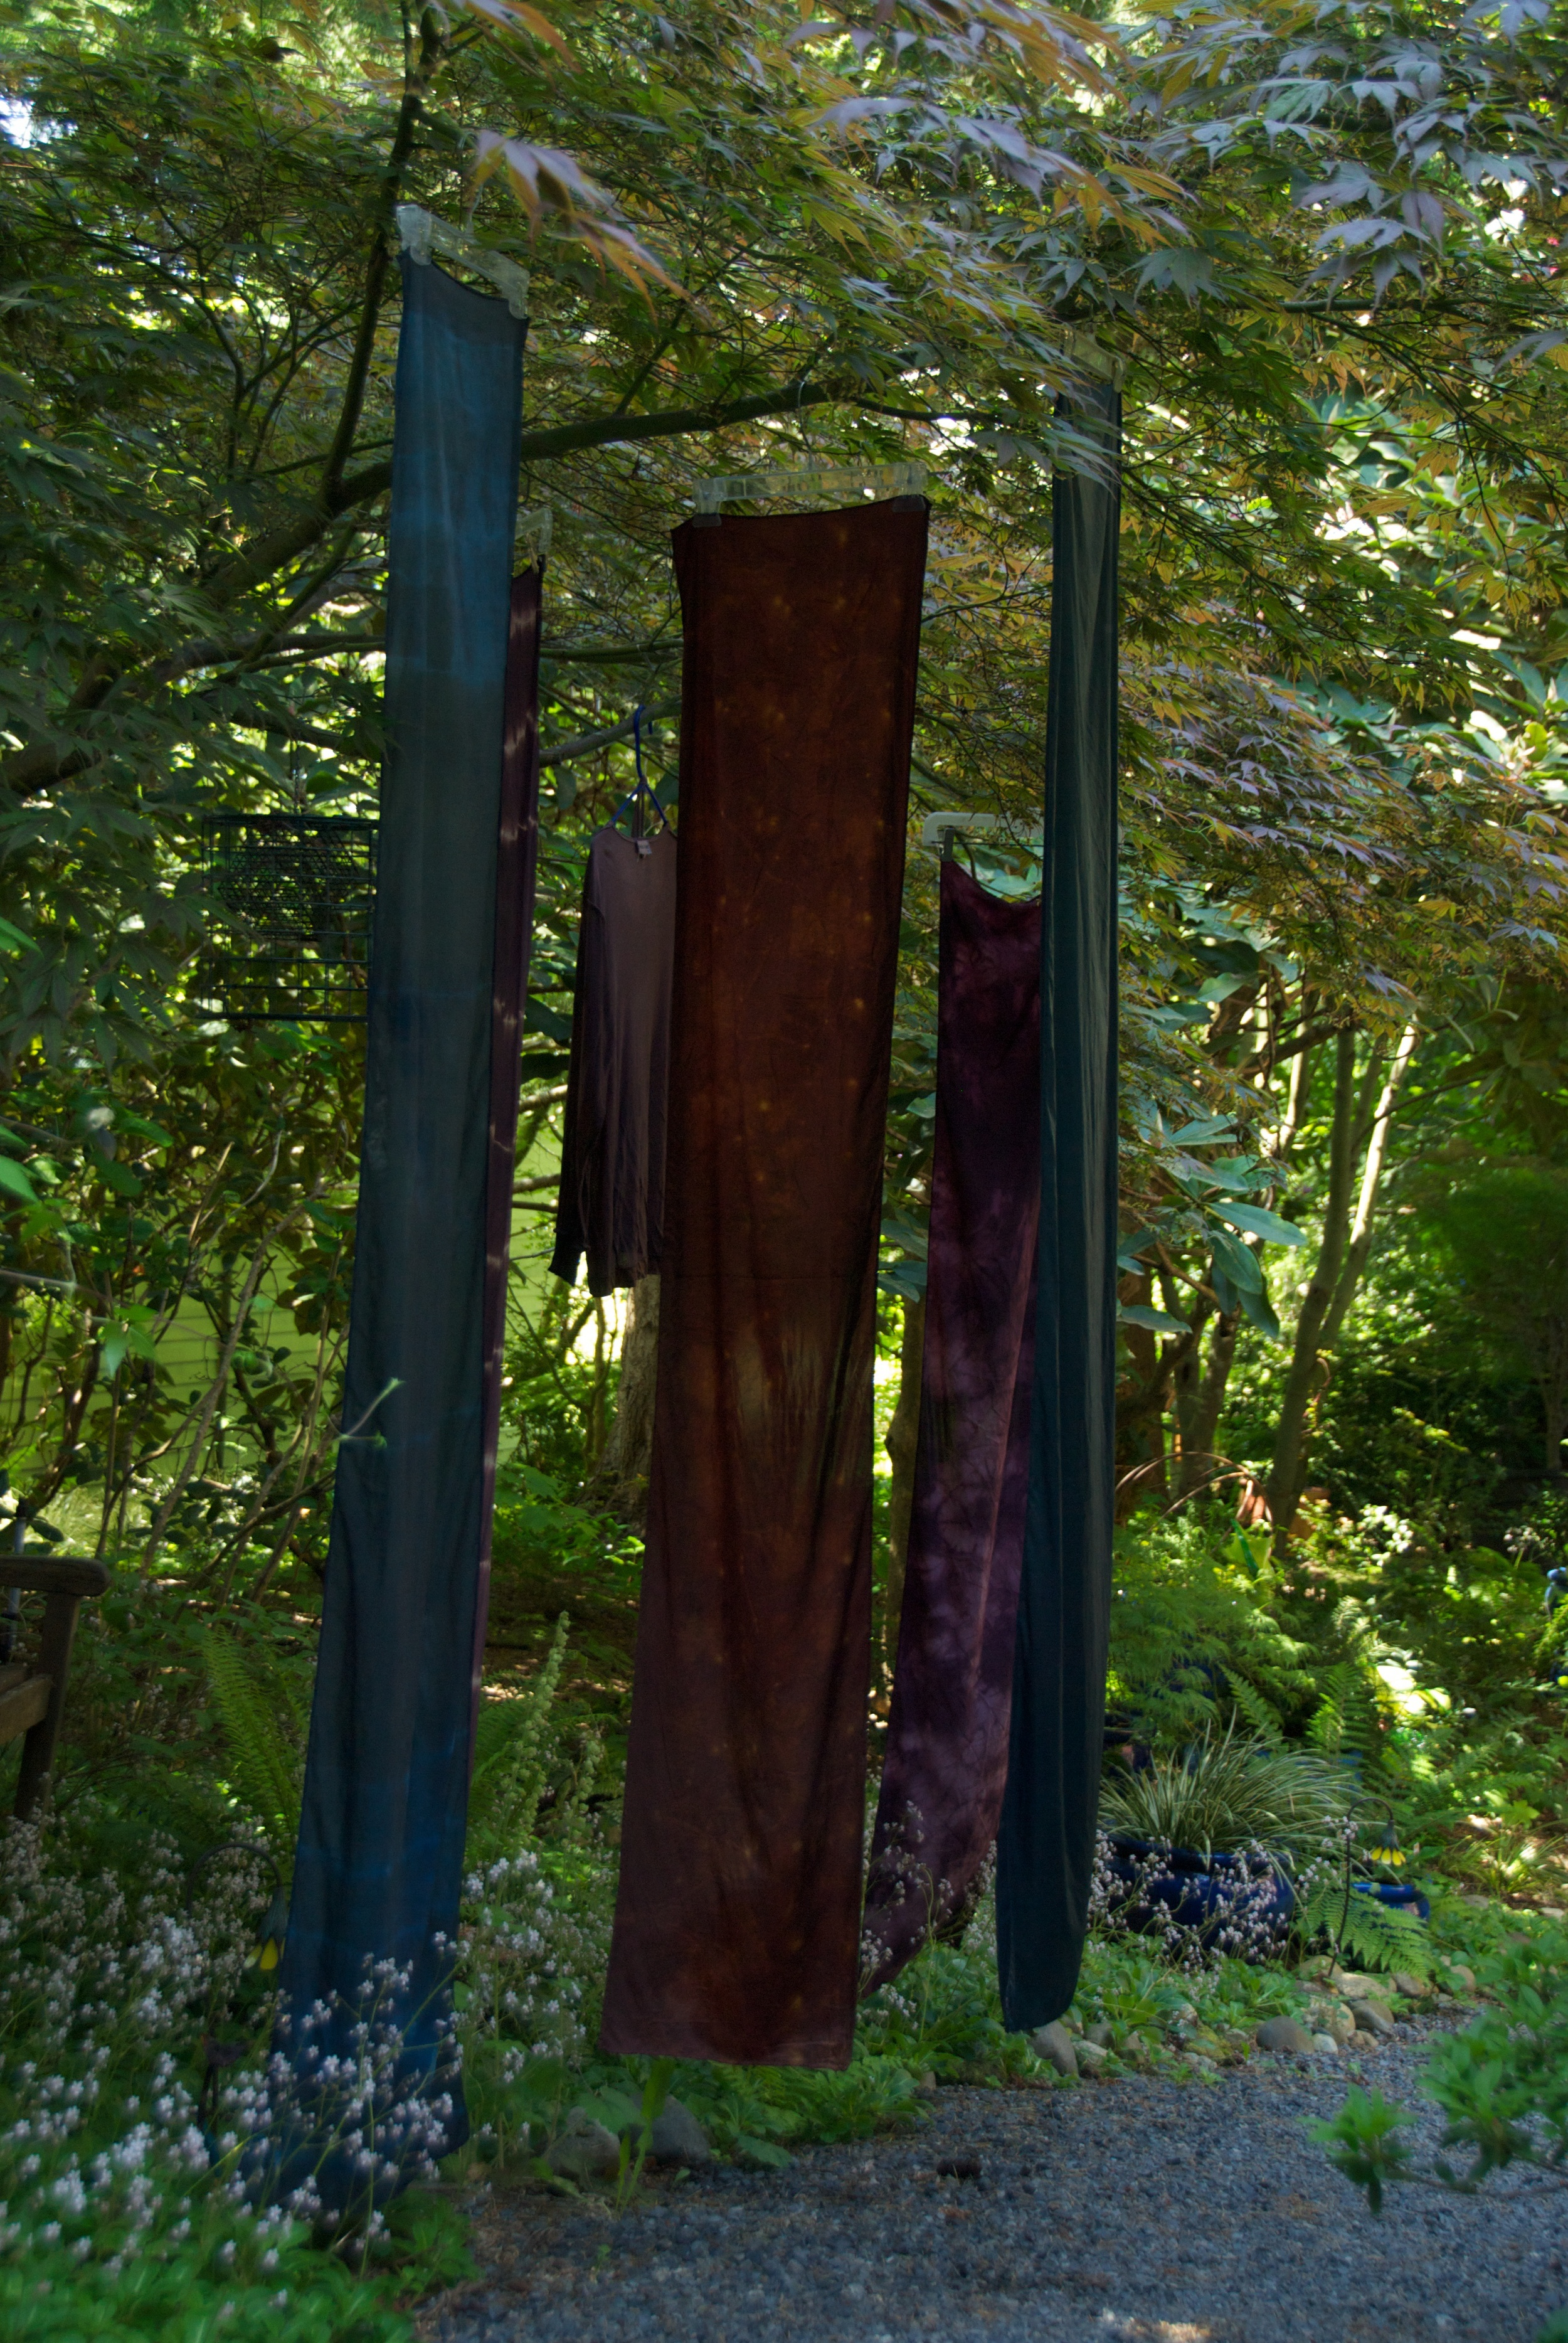 Shibori Dyed Items hanging to dry